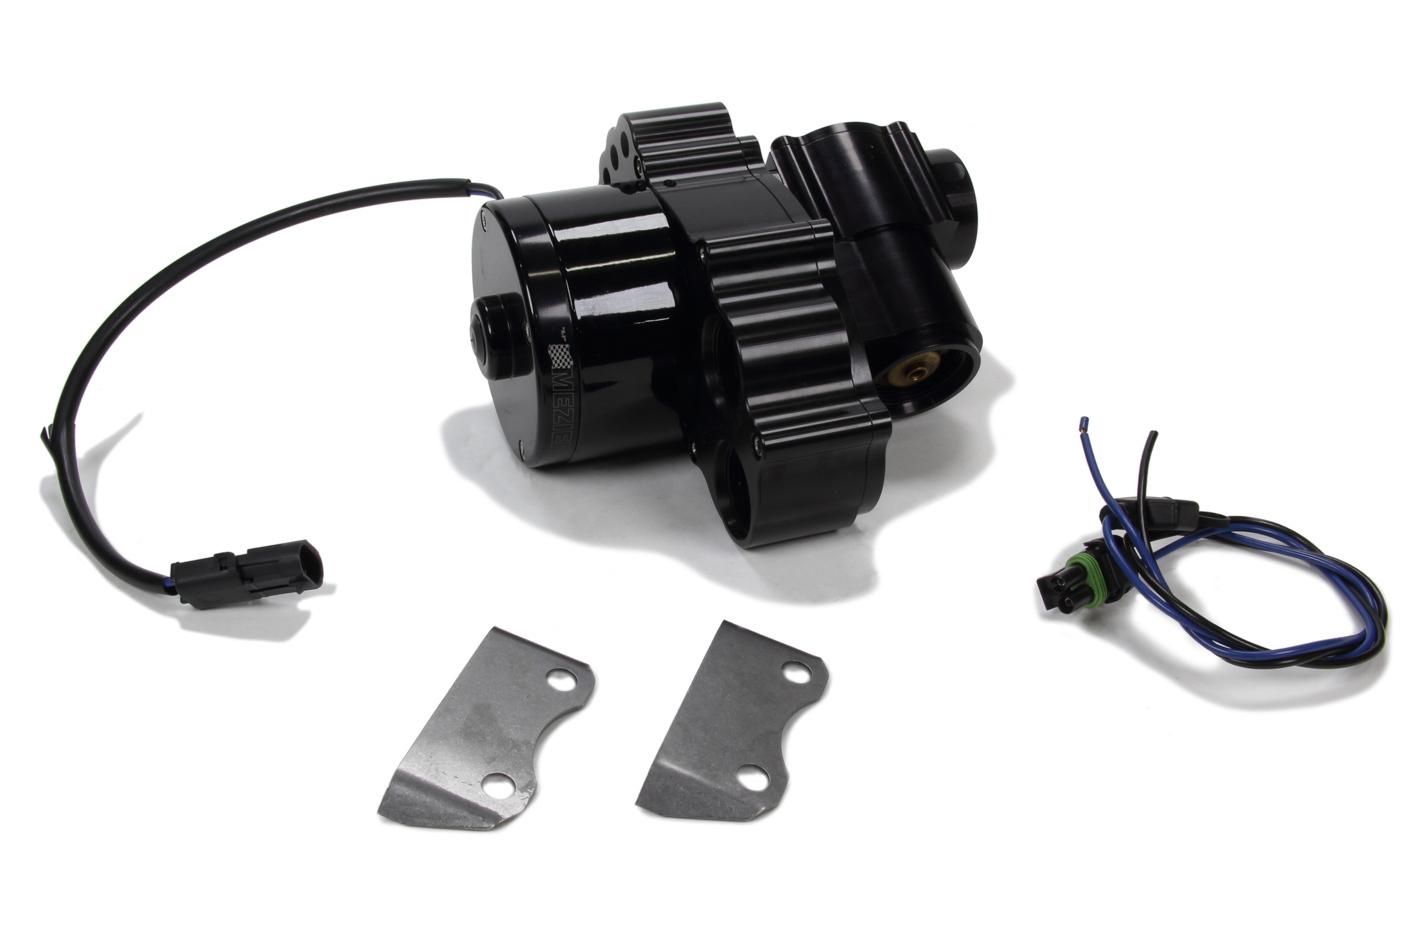 Inline Remote H/F Elect. Water Pump - Black